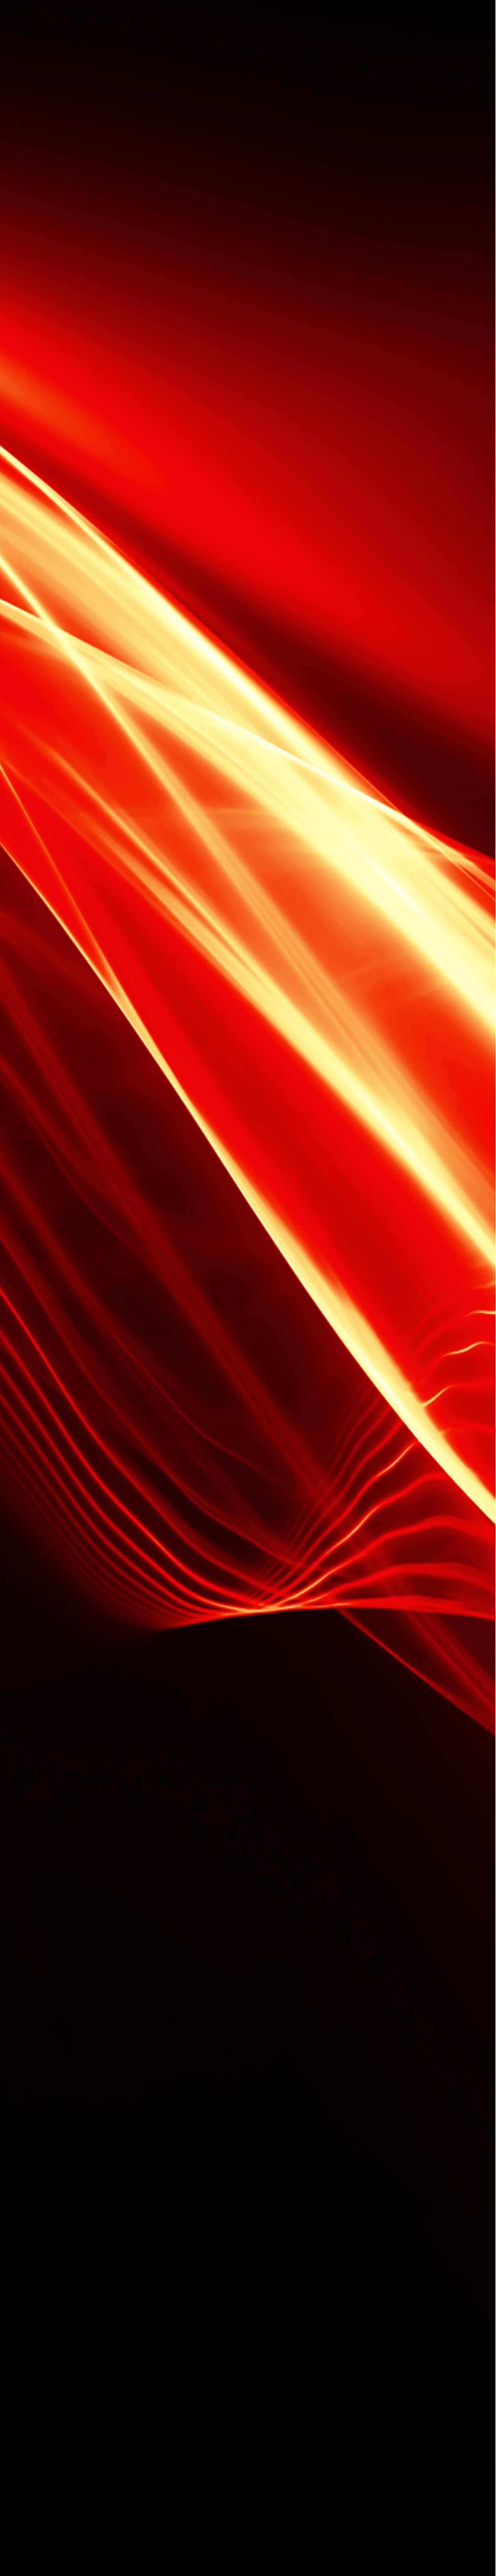 Black background with white, red , orange light flares